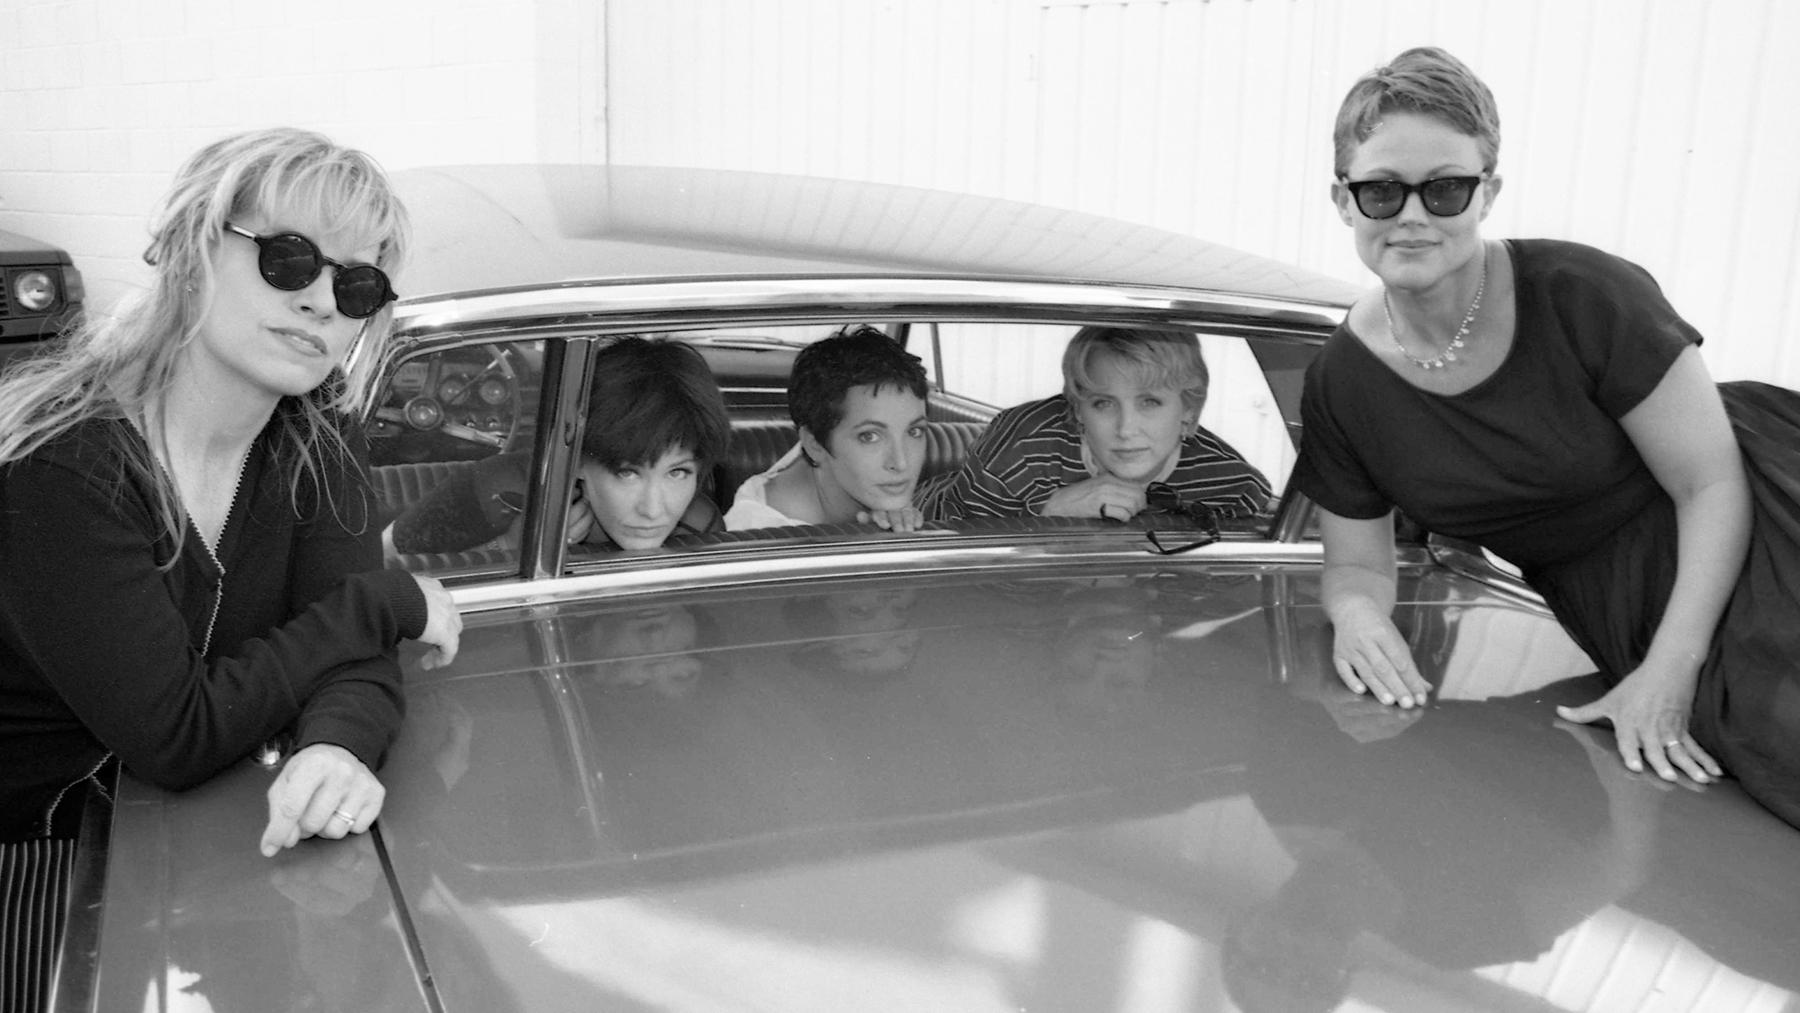 The Go-Go's Drop 'Club Zero' Video Ahead of Documentary - Rolling Stone